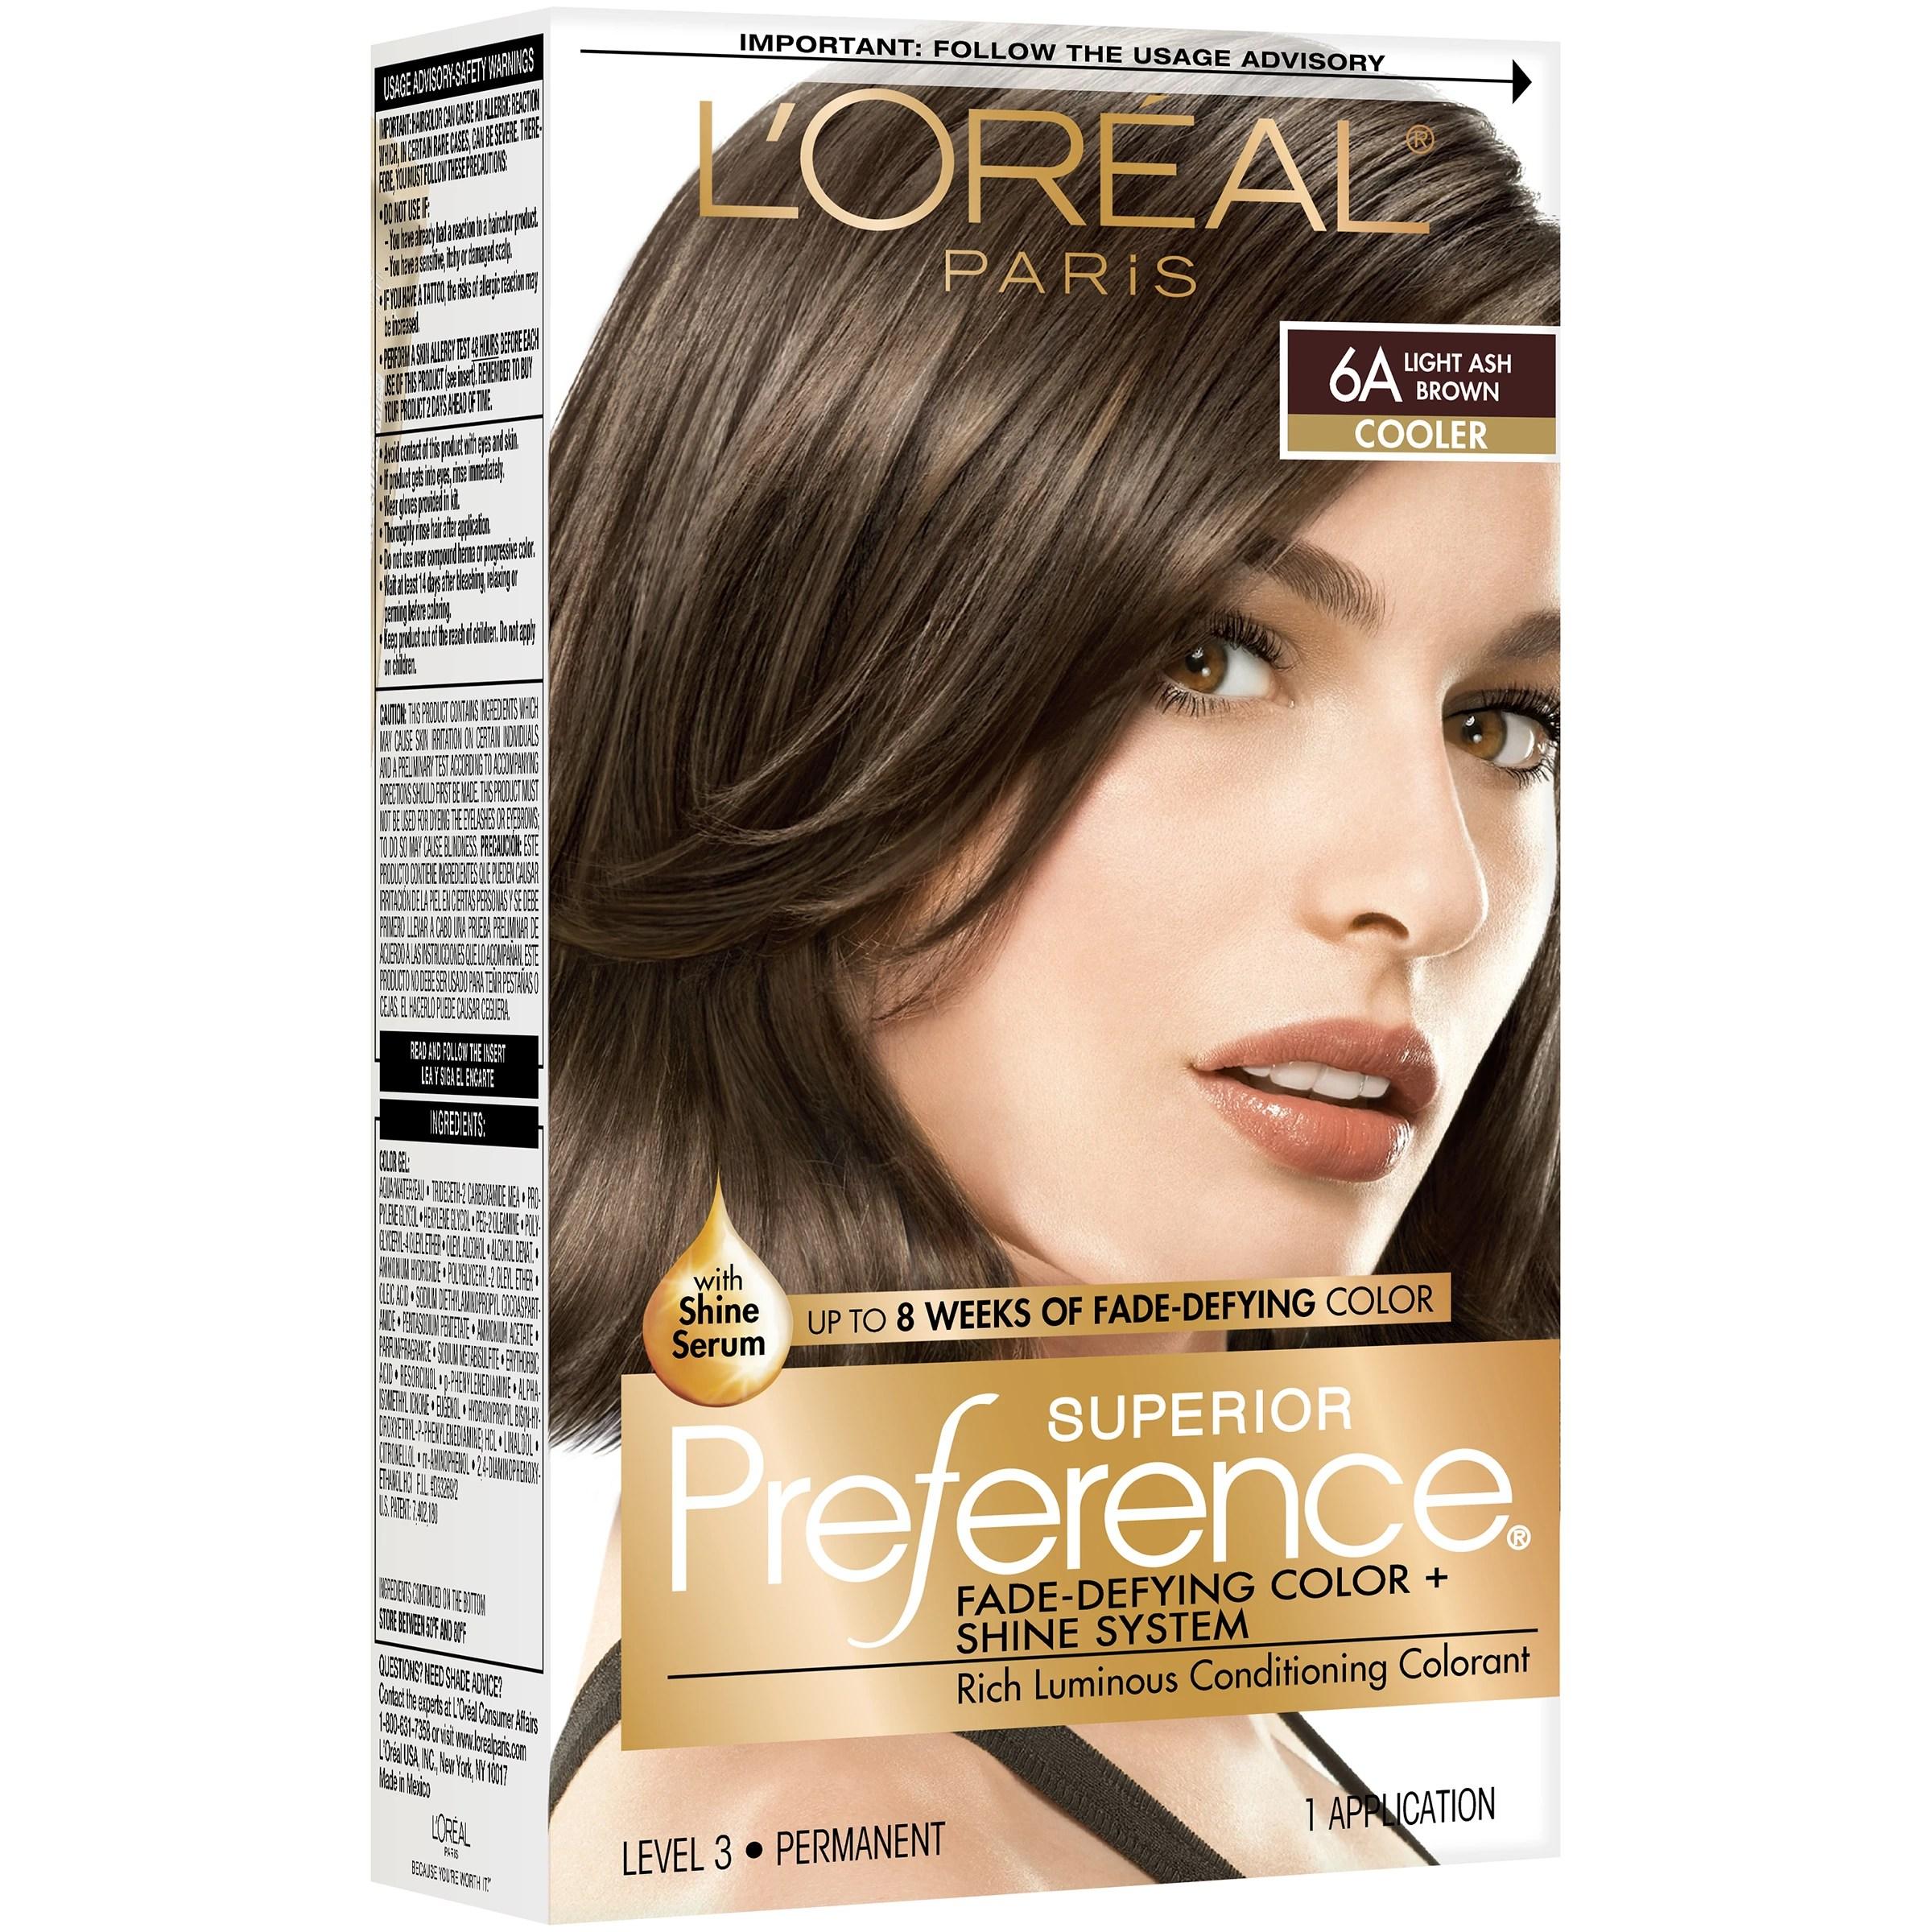 L Oreal Paris Superior Preference Permanent Hair Color 6a Light Ash Brown Shop Hair Color At H E B